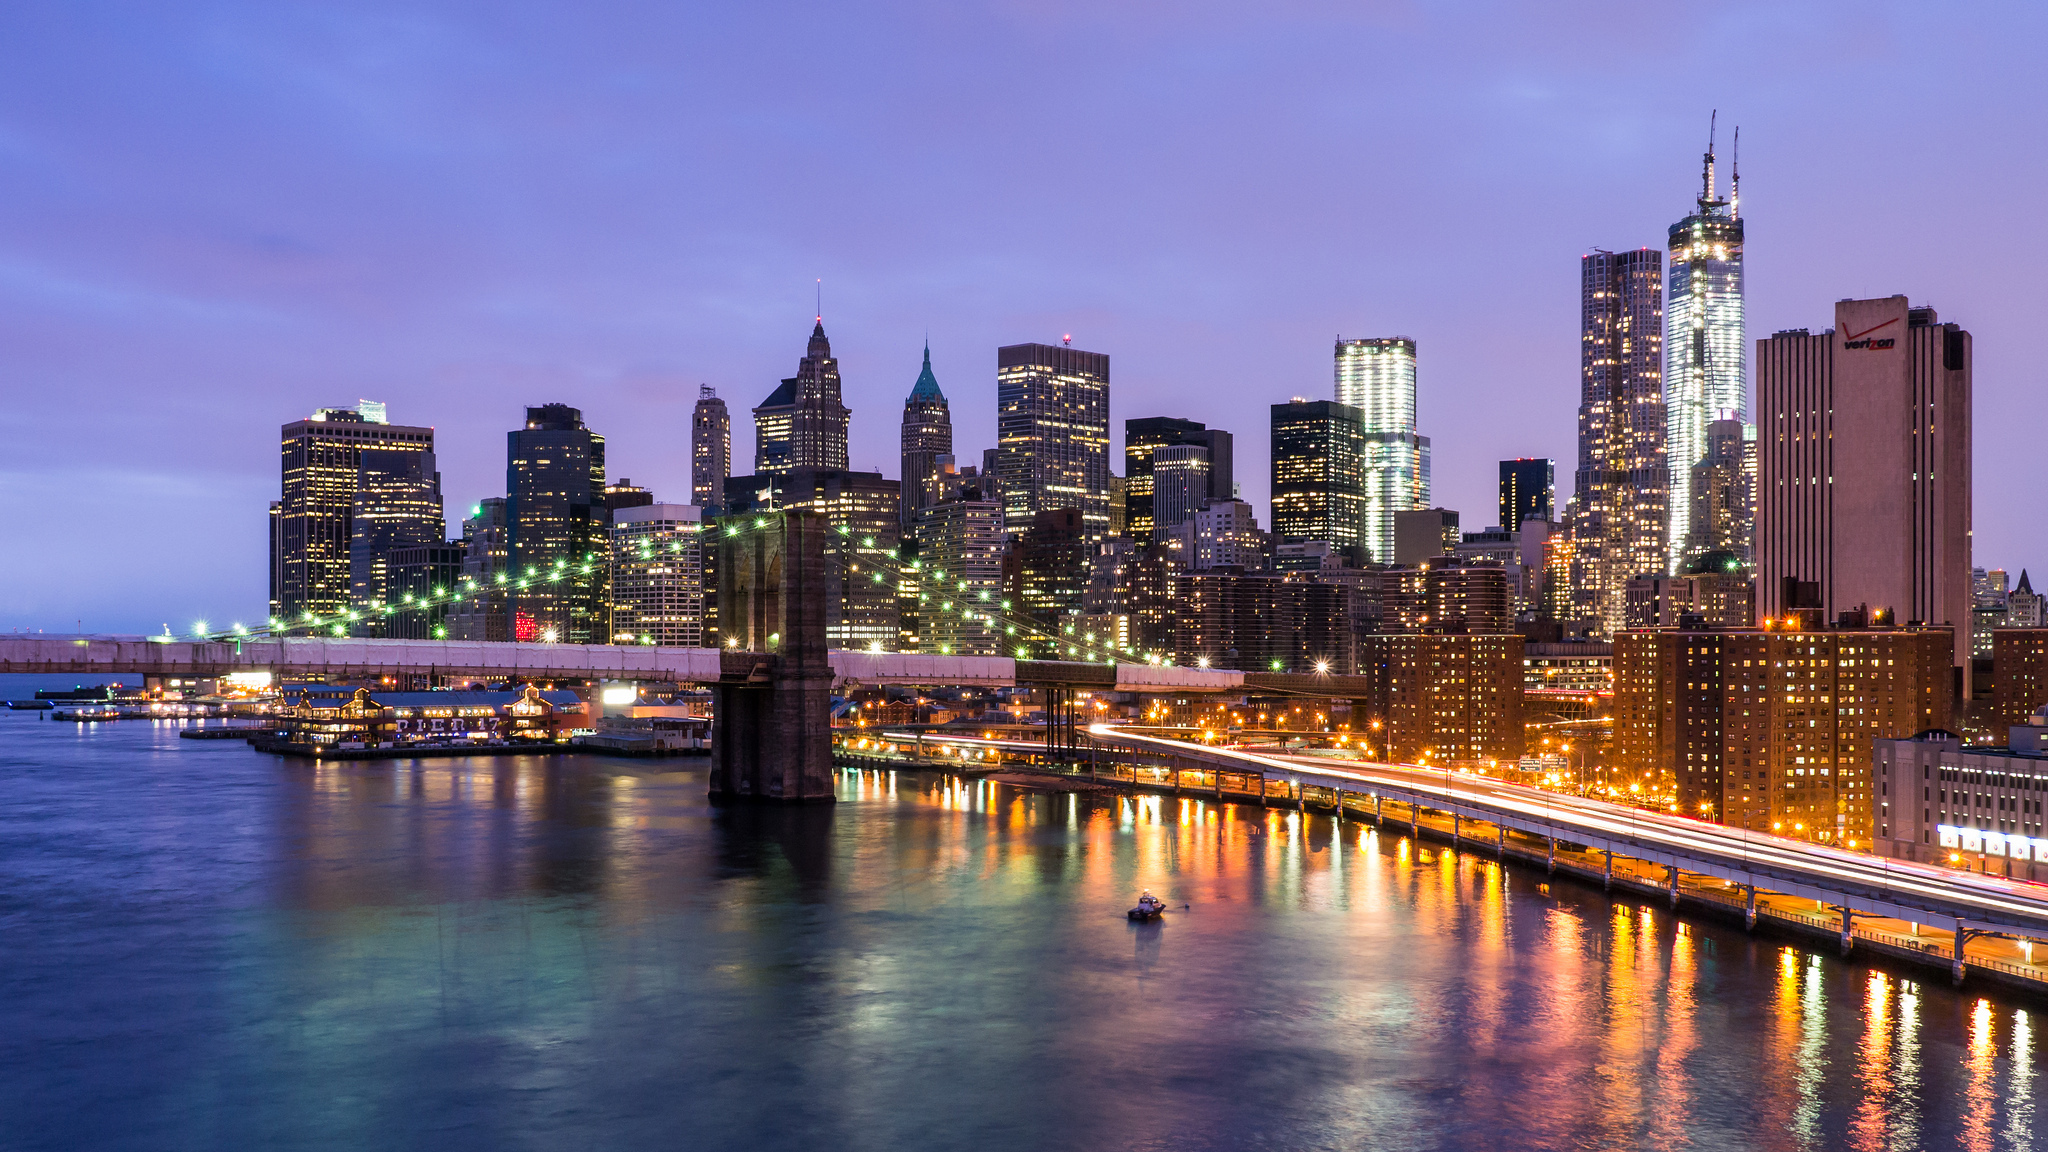 new york city desktop wallpaper hd